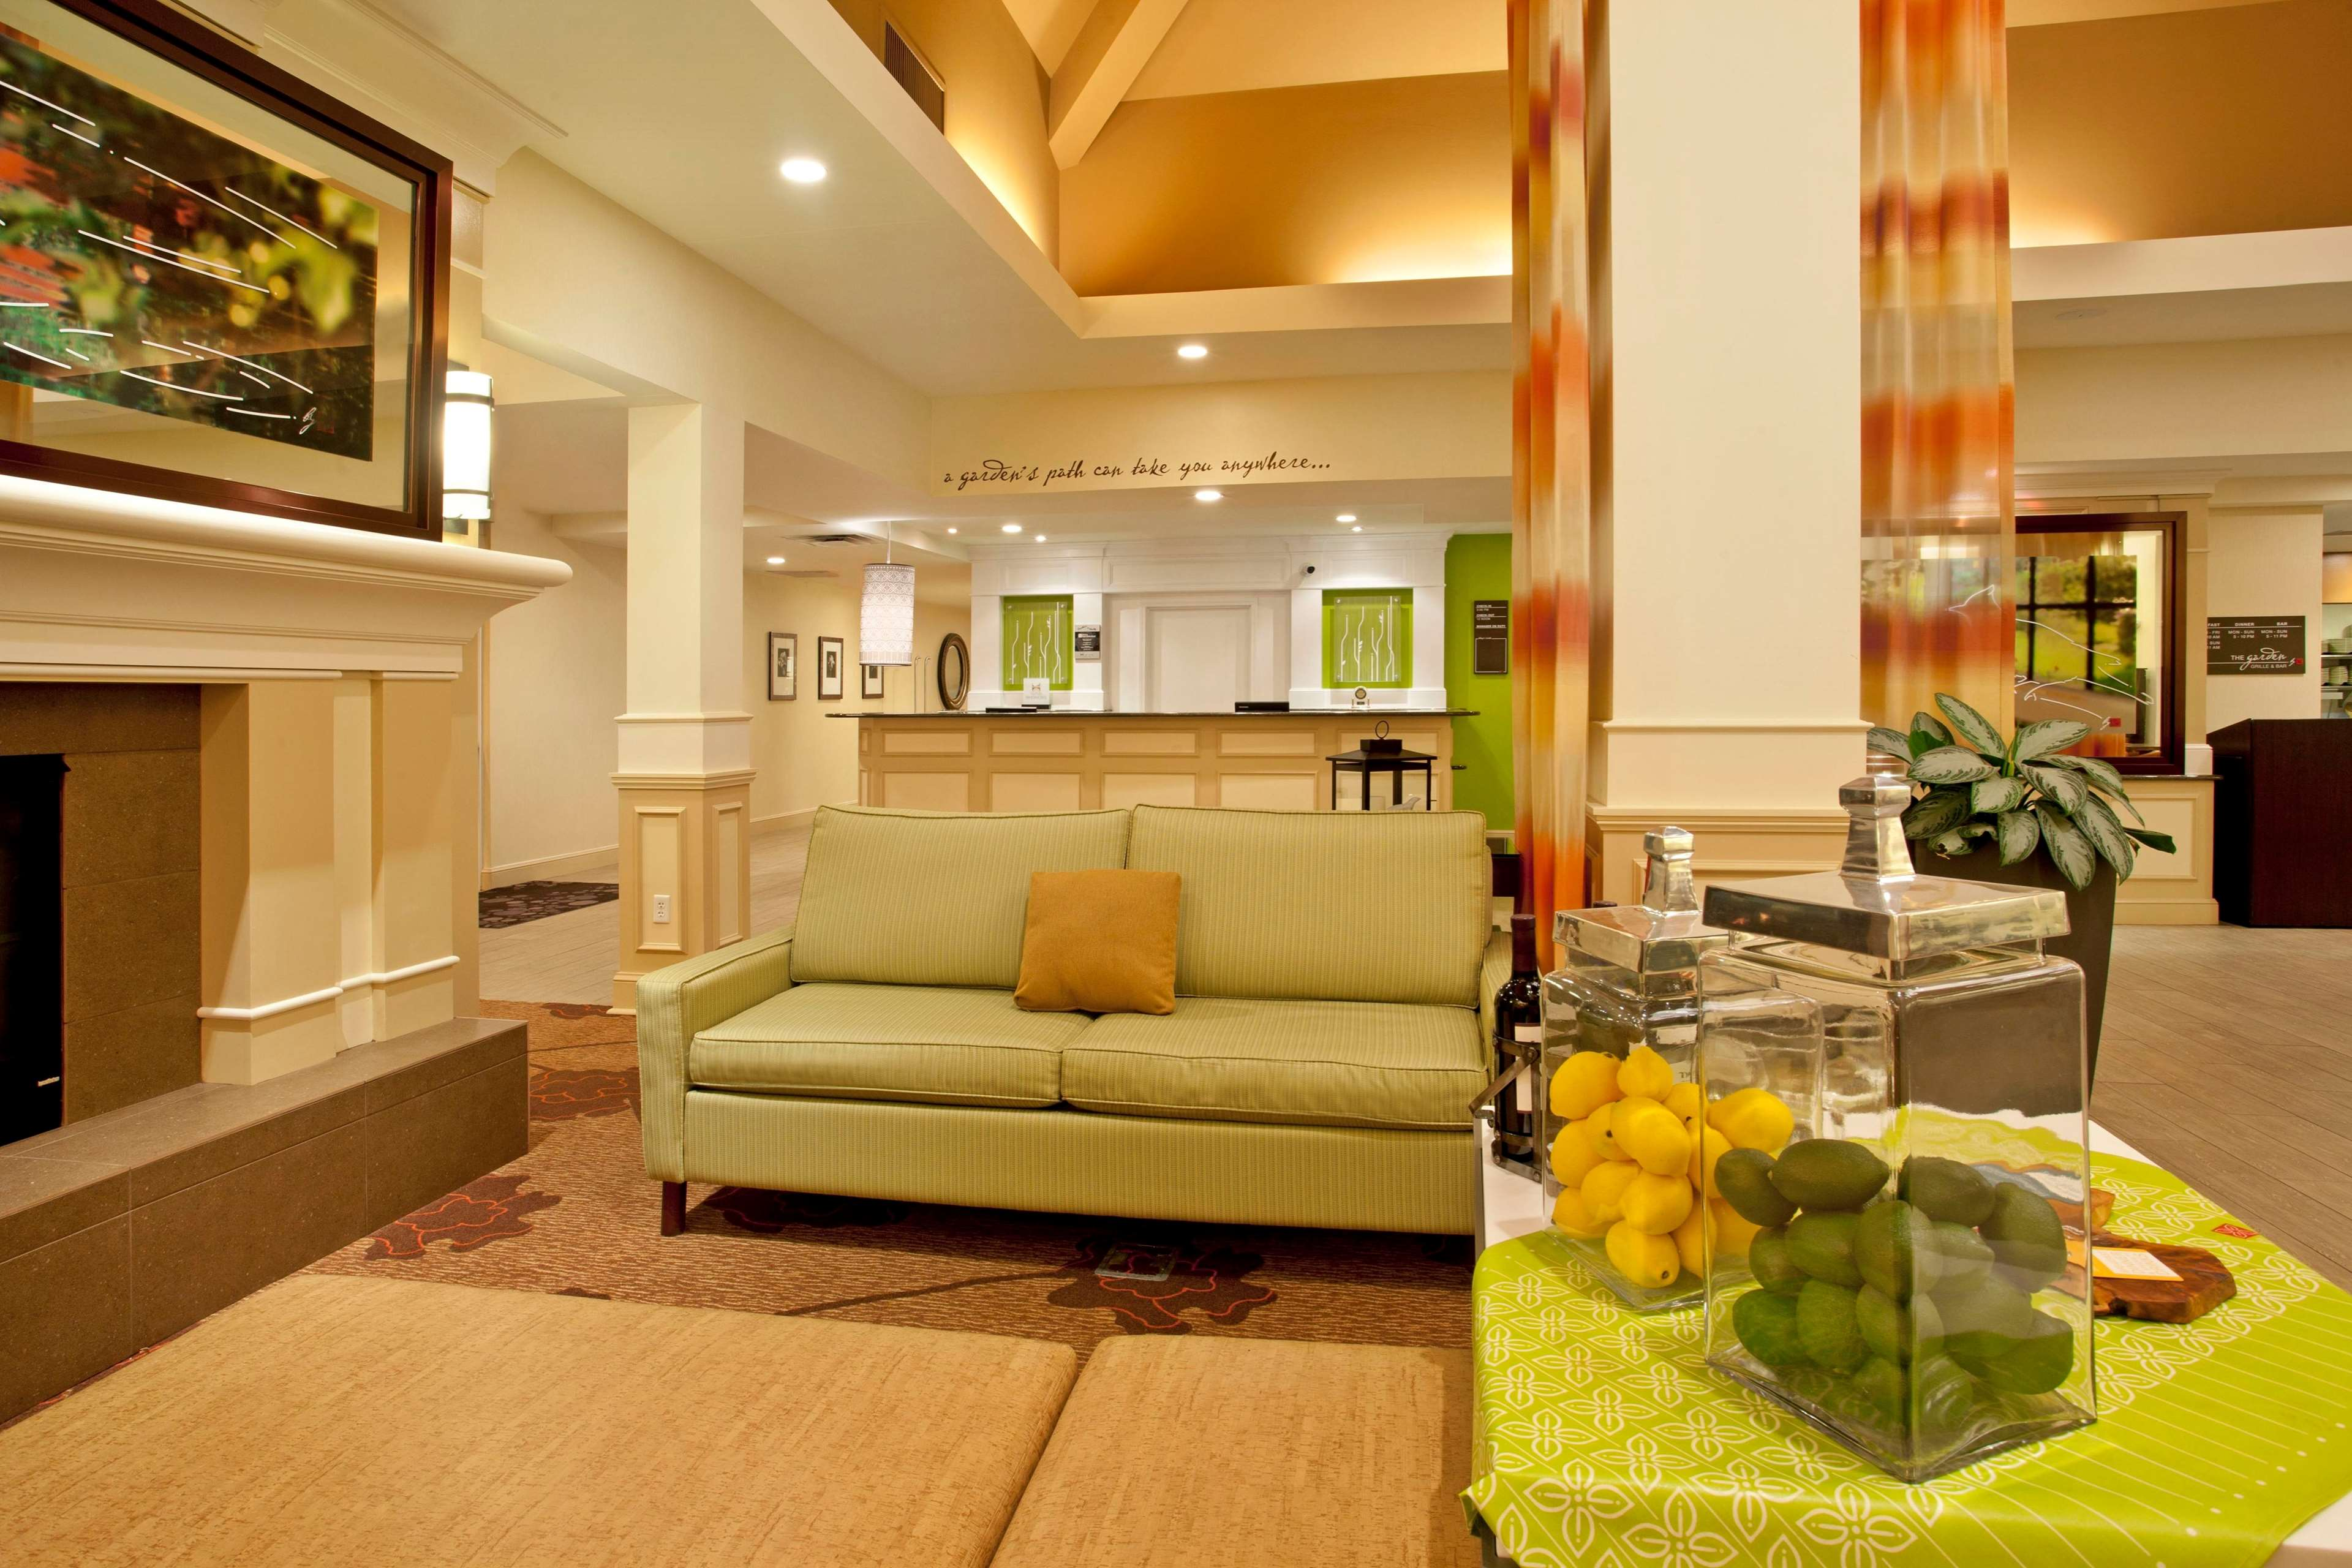 Hilton Garden Inn Fort Collins image 19